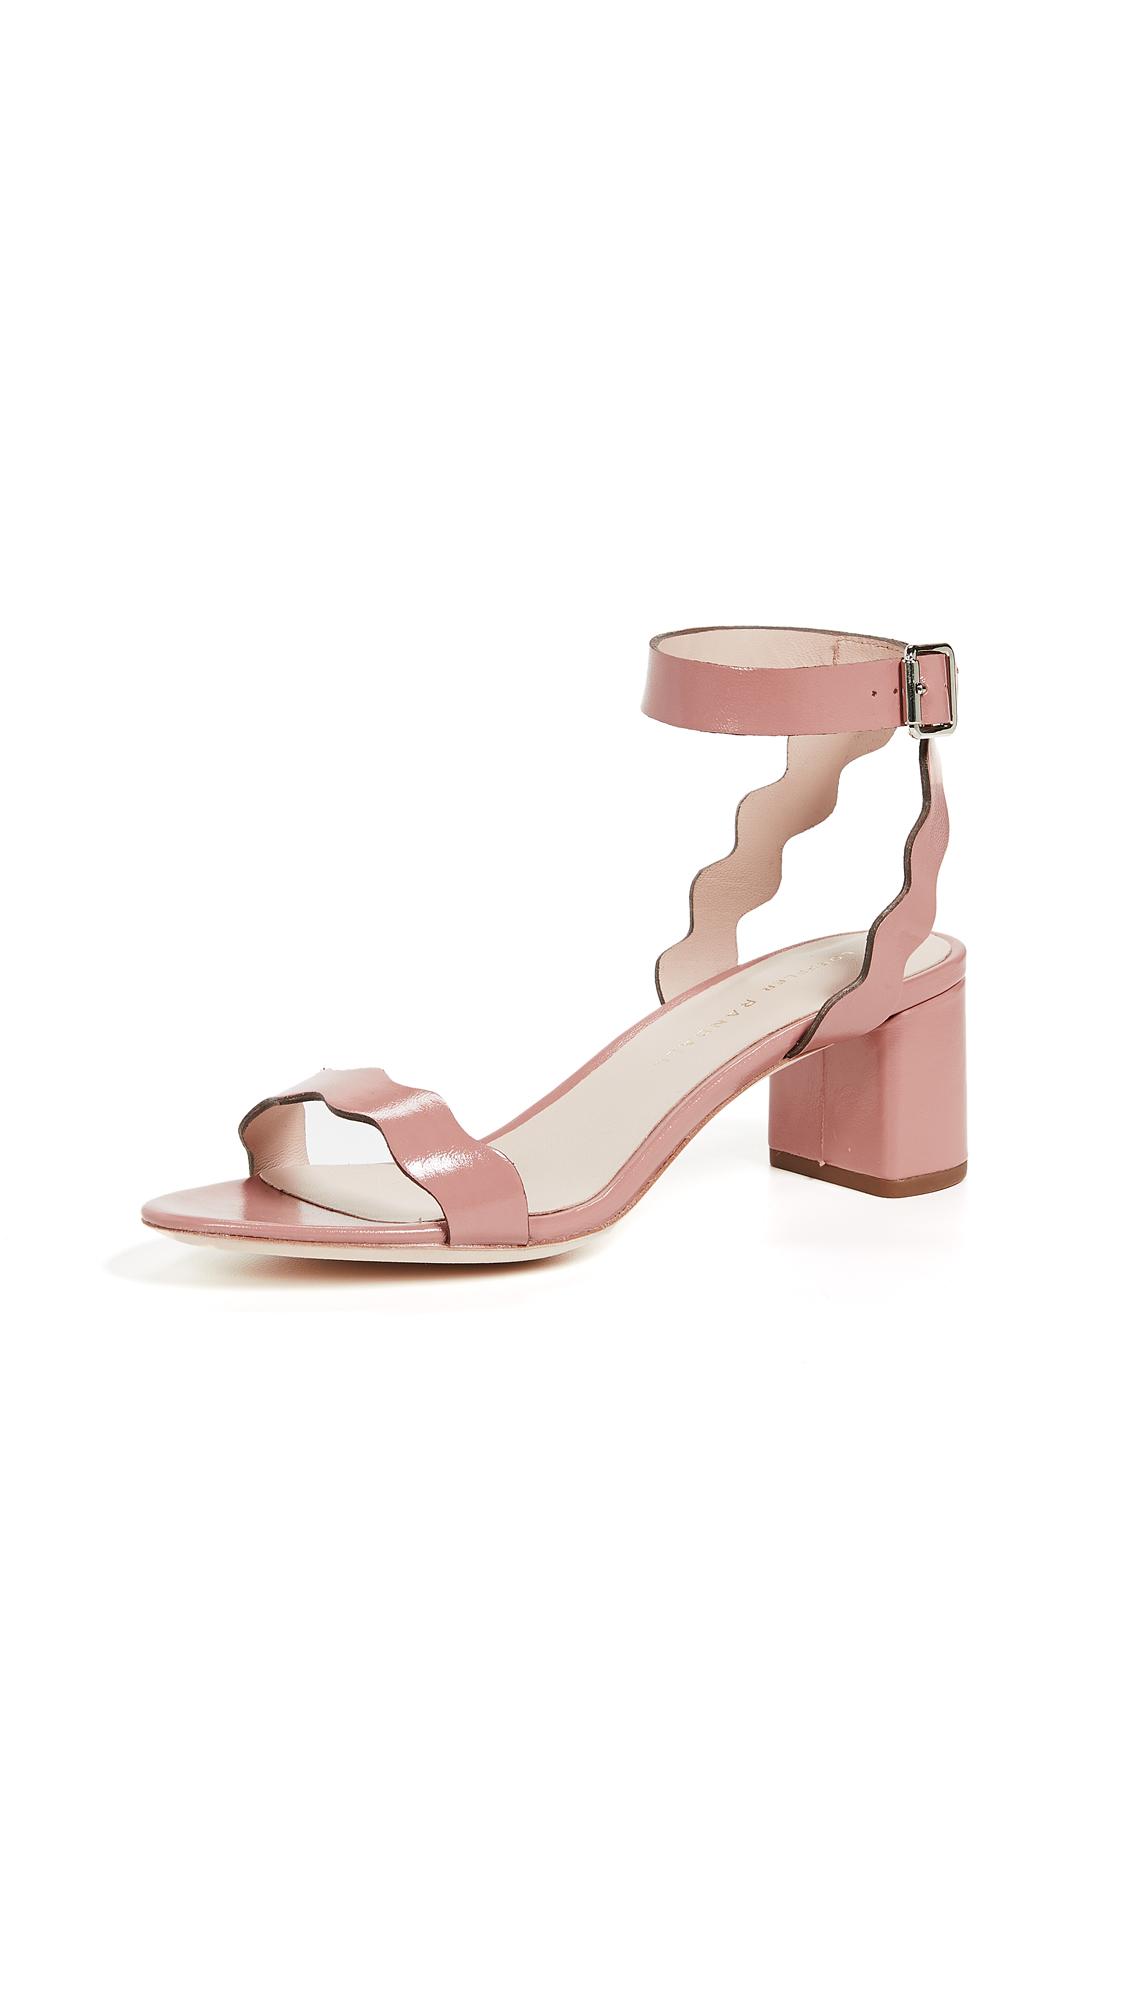 Loeffler Randall Emi City Sandals - Coquille